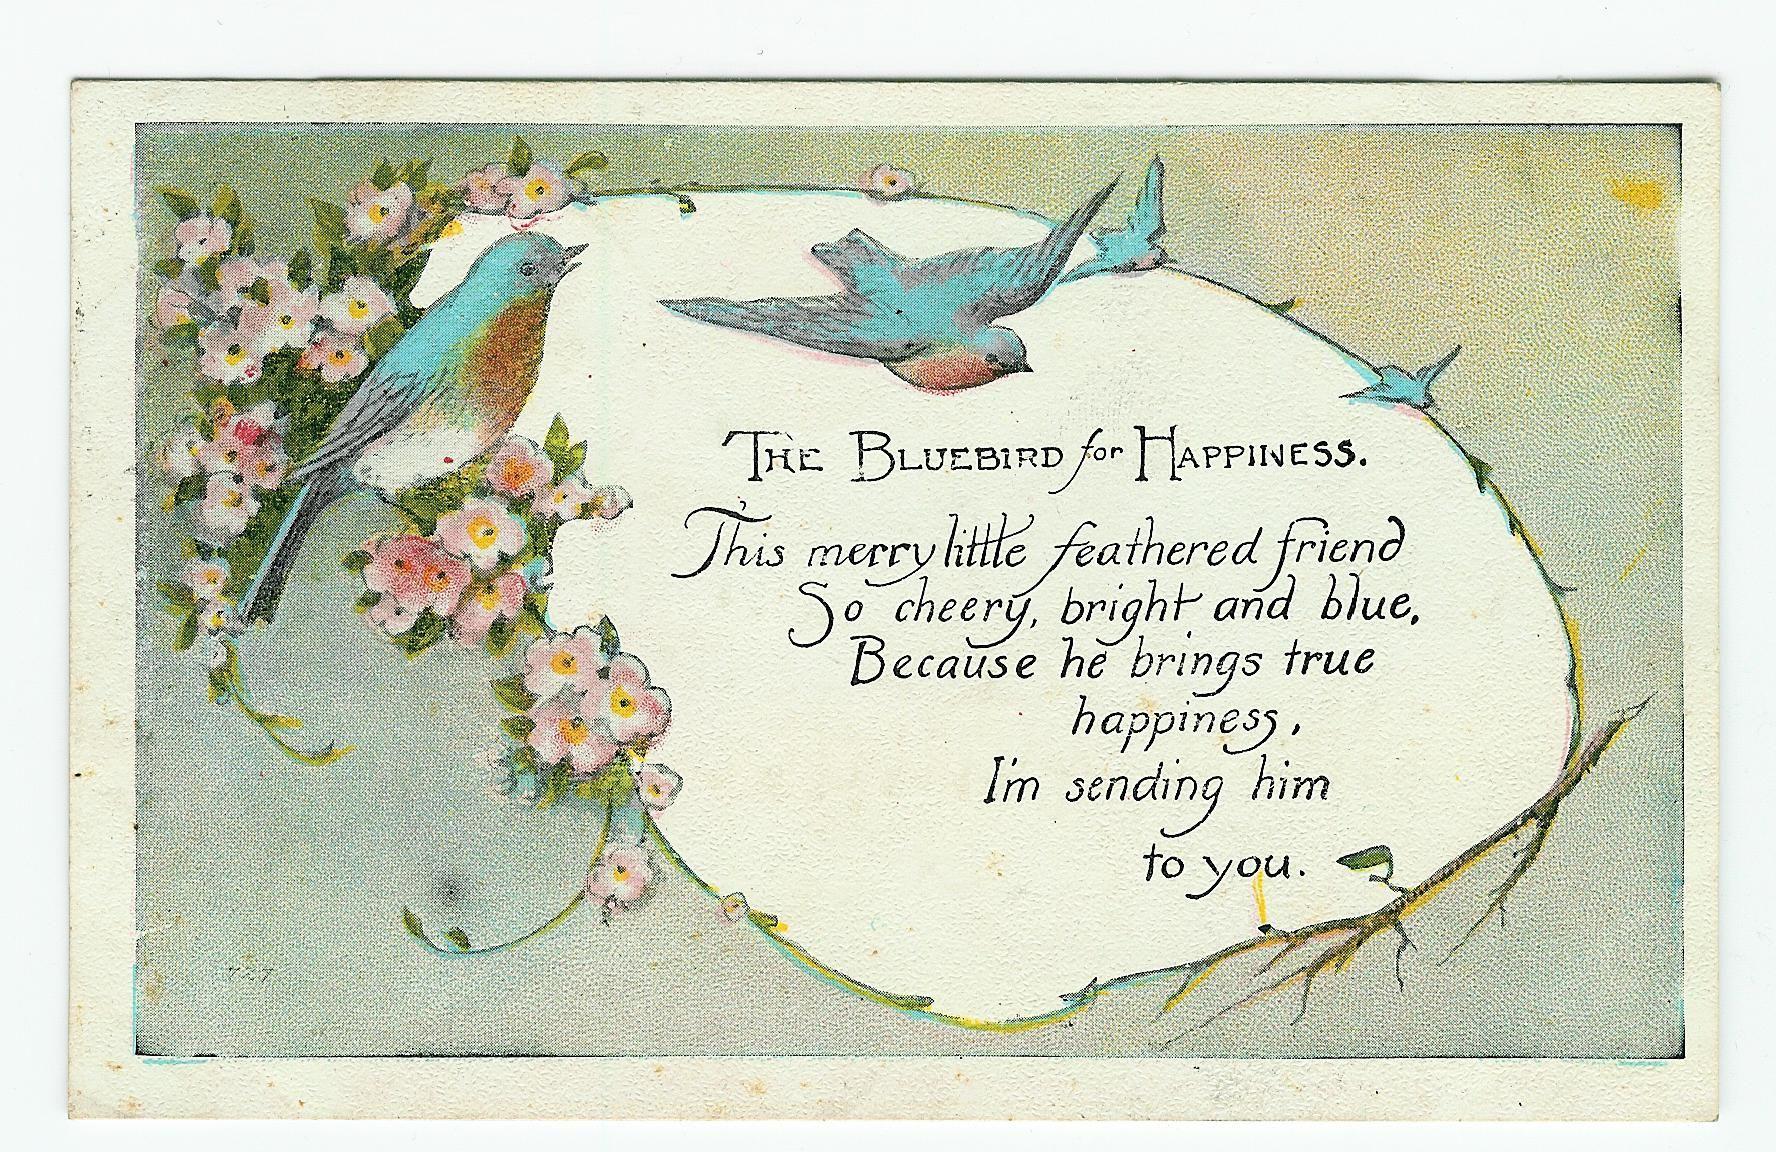 Bluebird of happiness happiness of bluebirds happiness poem bluebird of happiness happiness of bluebirds biocorpaavc